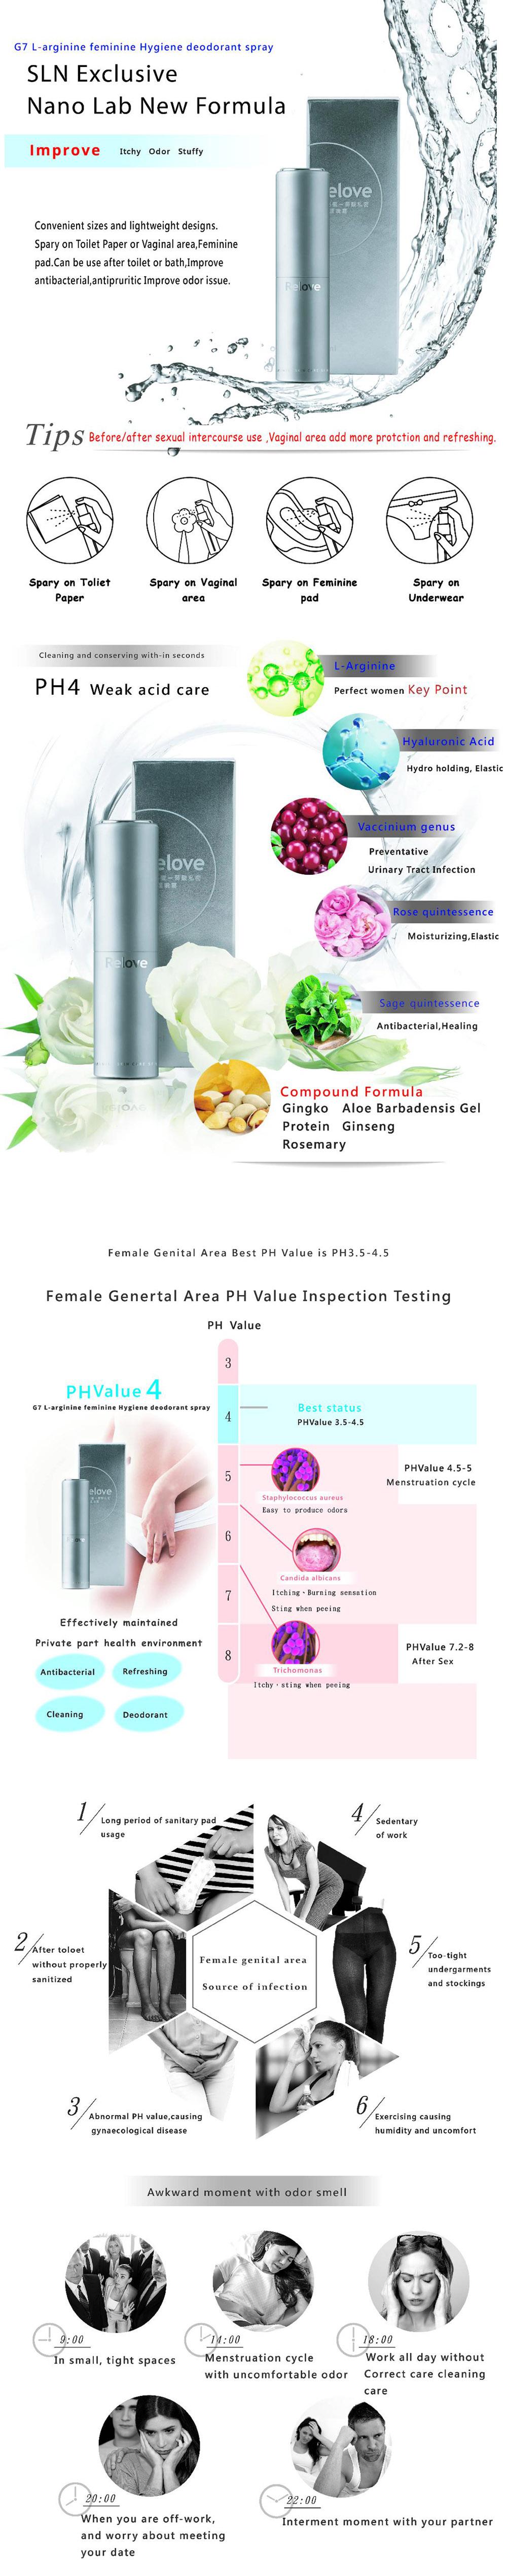 G7 Feminine Hygiene Deodorant Spray